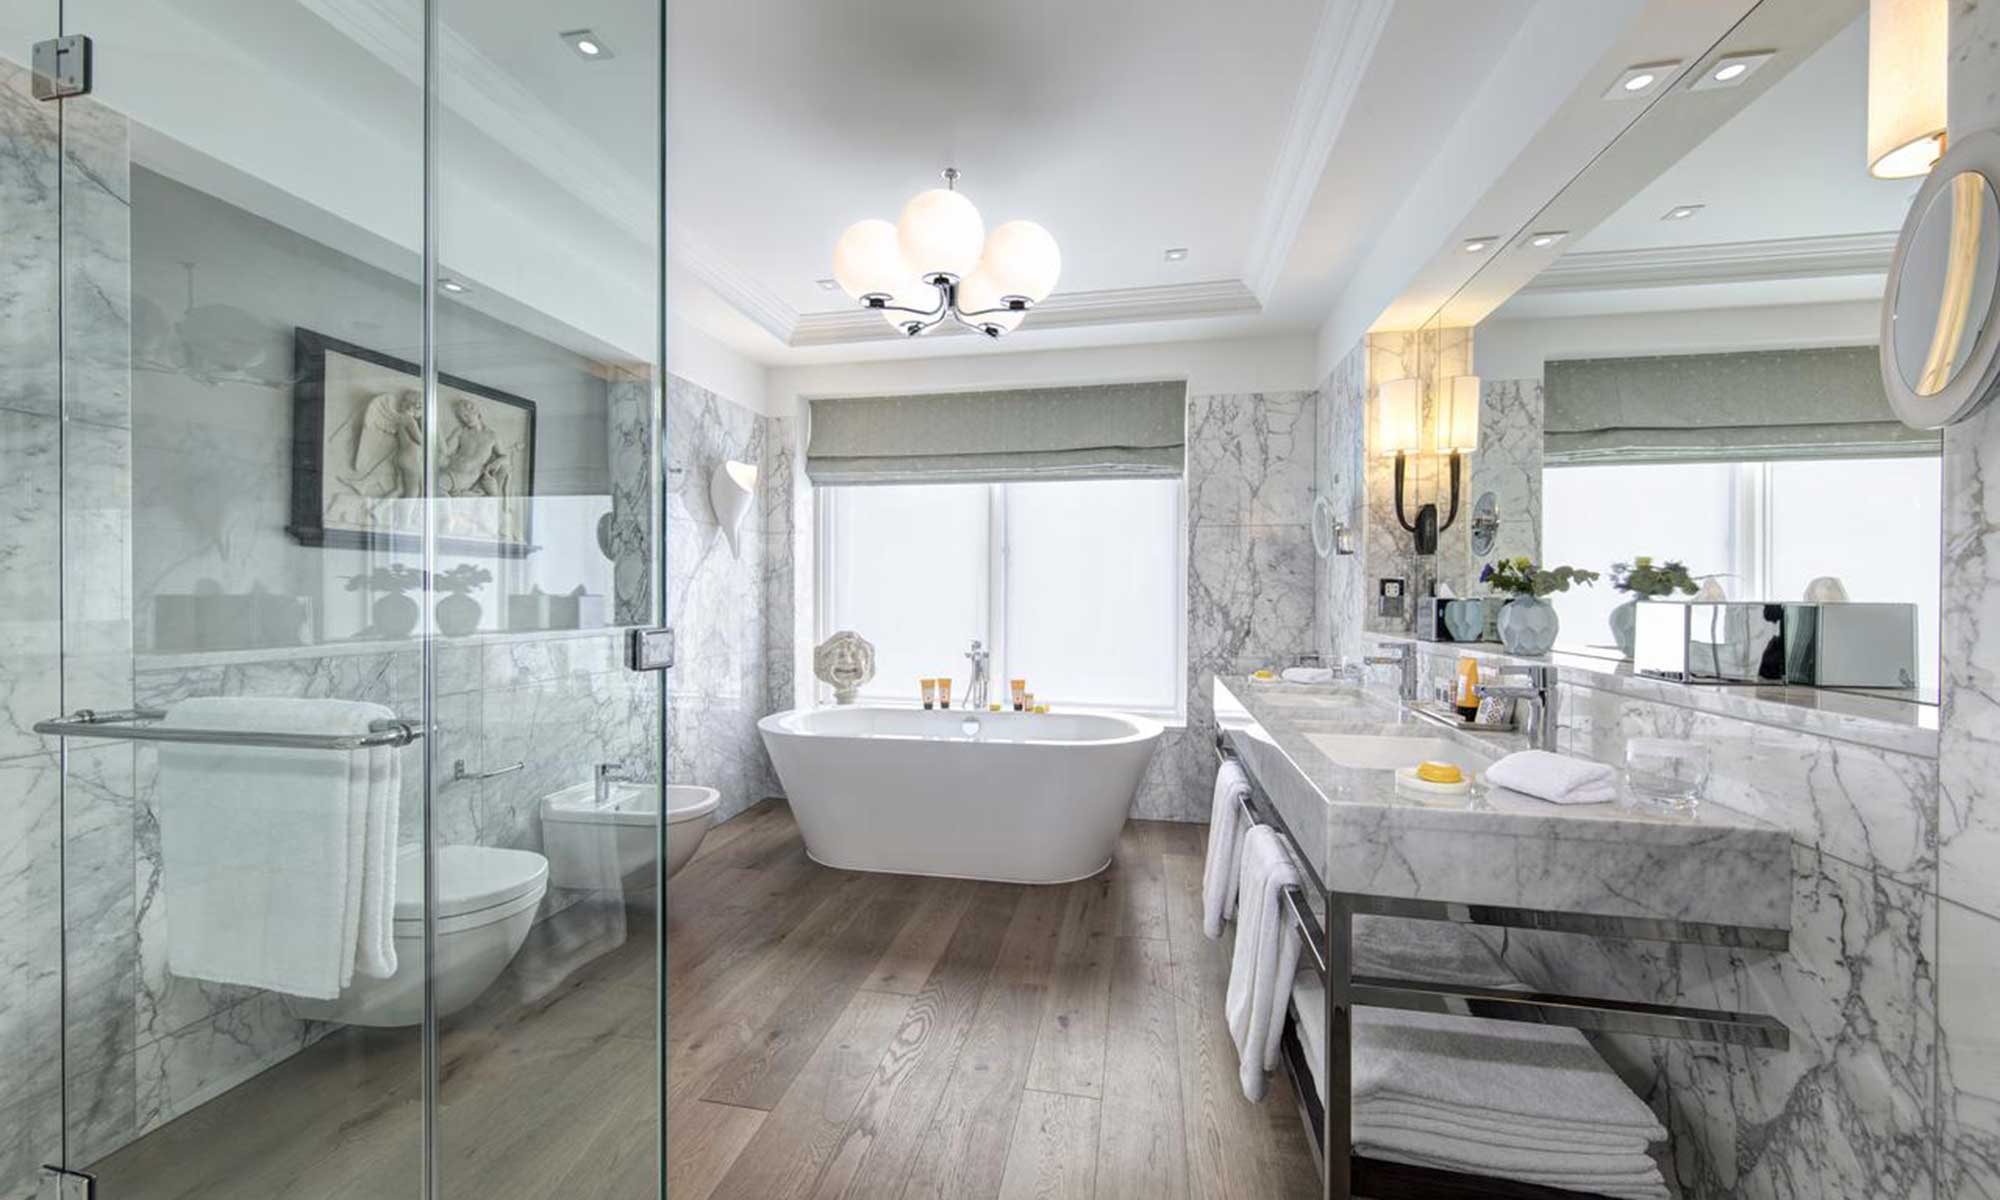 Bathroom at the Balmoral Hotel